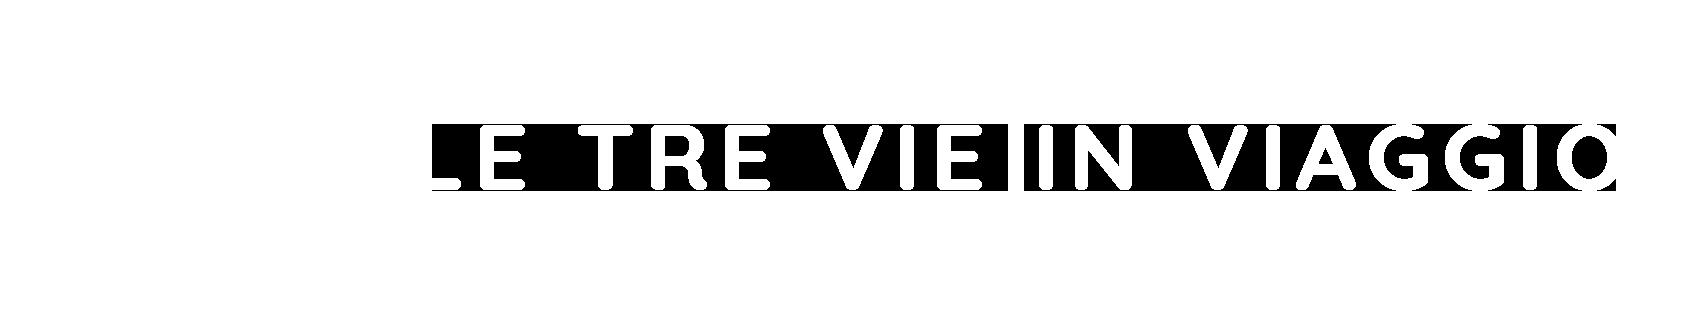 Logo esteso bianco_LTVV 2